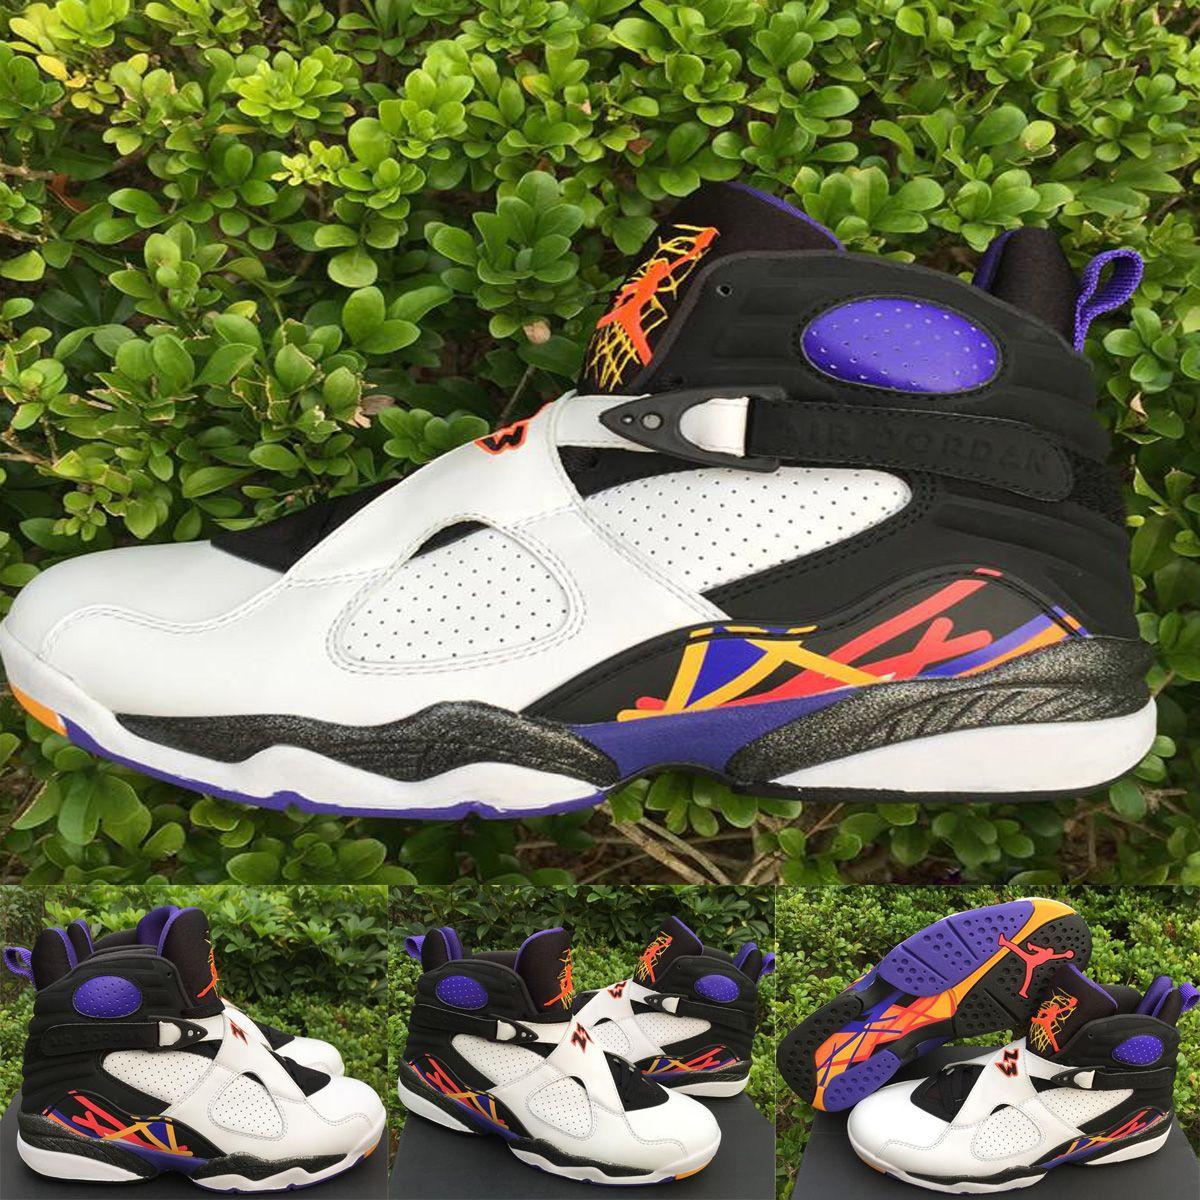 Mens Air Jordan 8 VIII) Retro White shoes